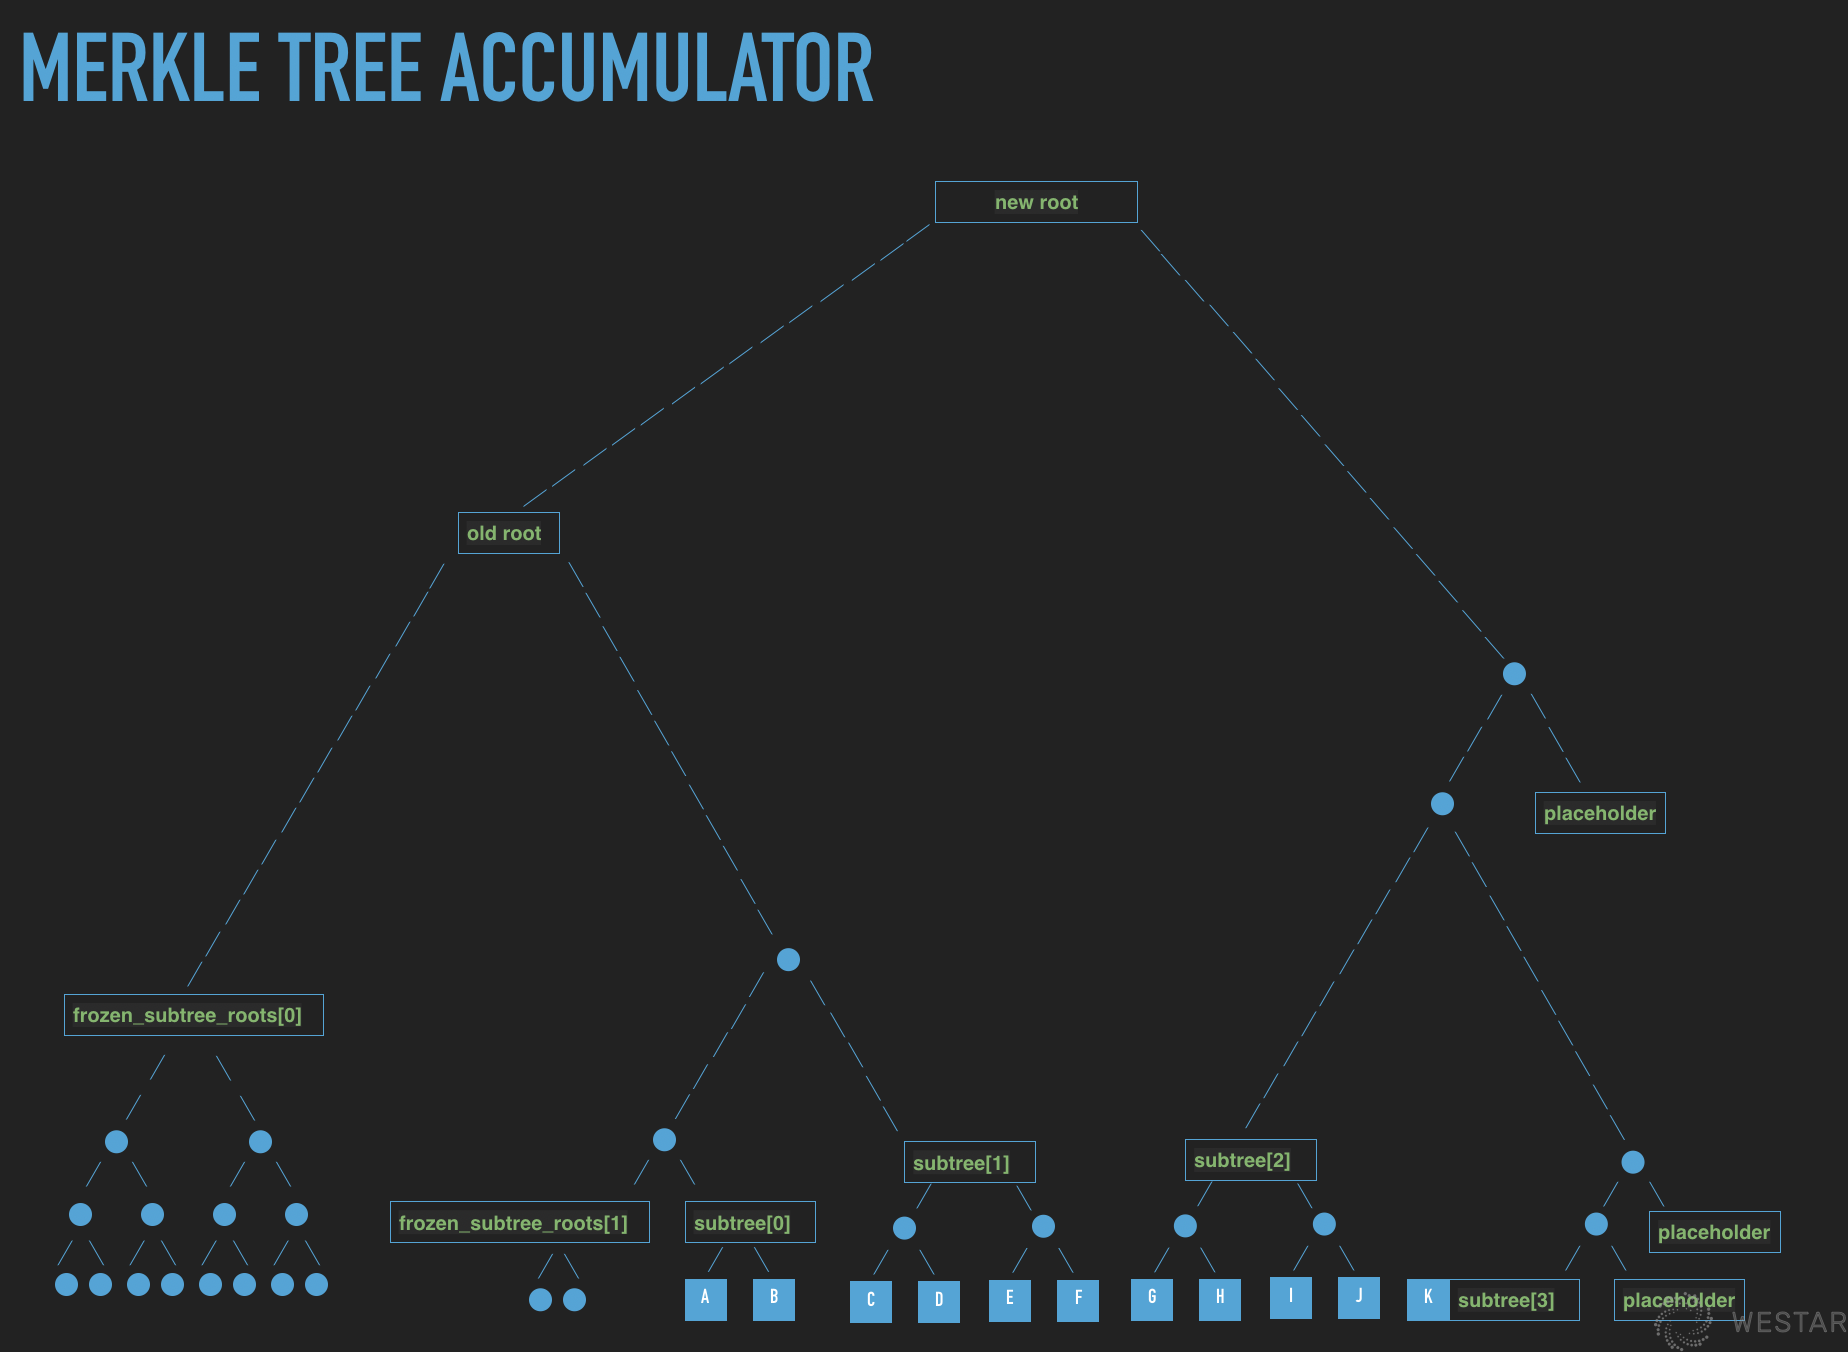 Merkle tree accumulator